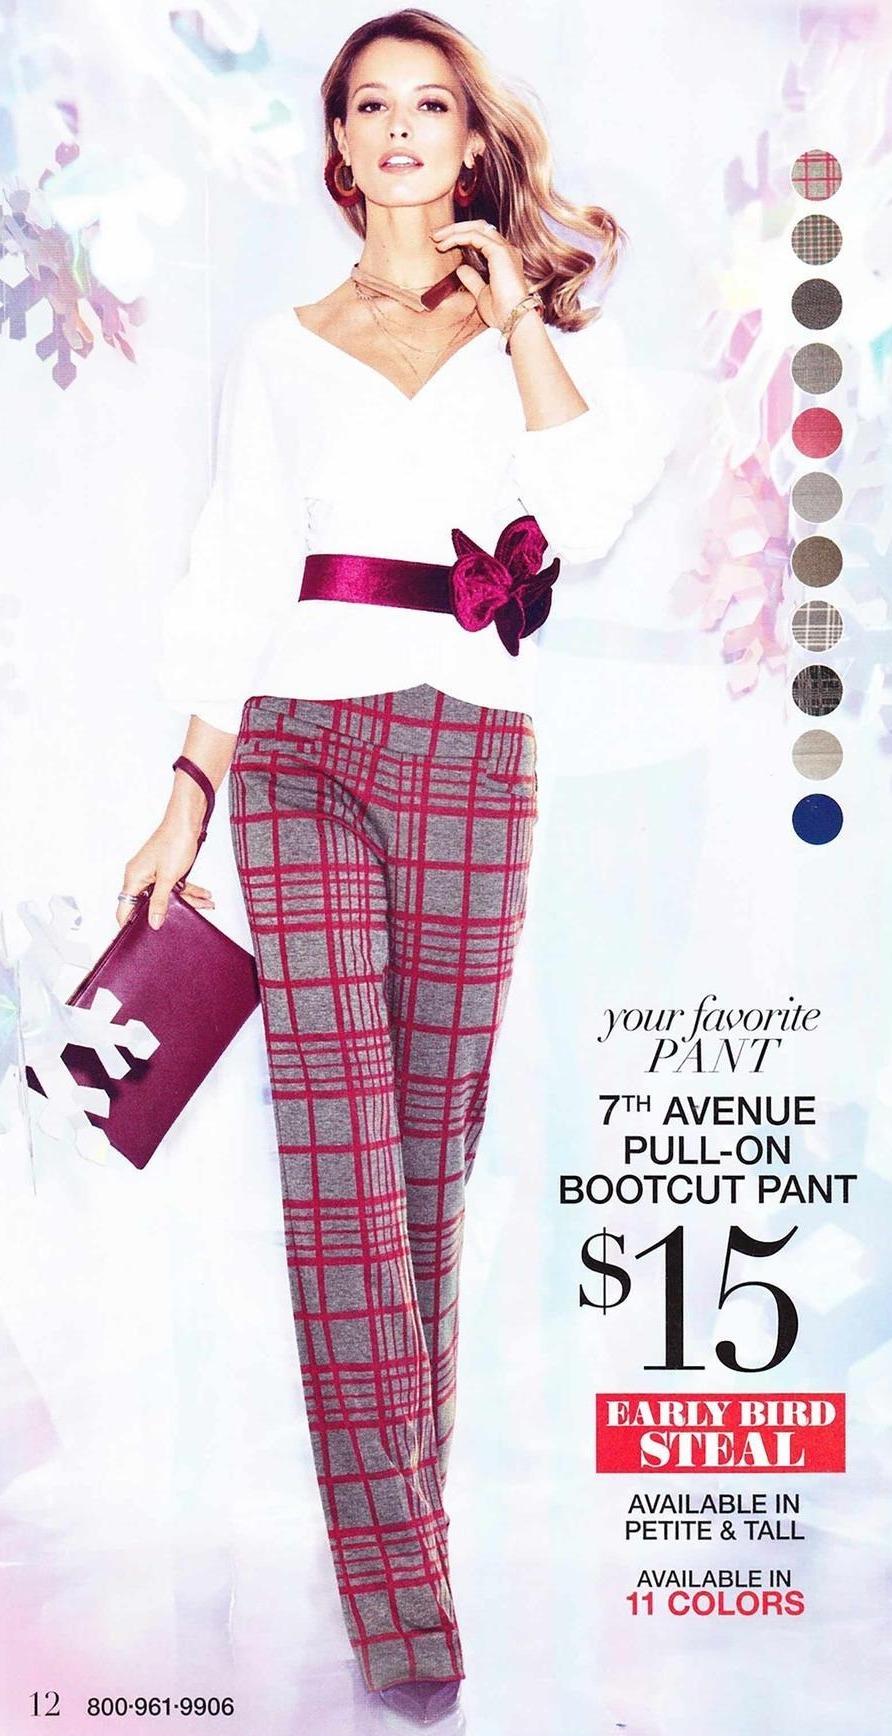 New York and Company Black Friday: Women's Ruffled-Sleeve Wrap Shirt for $27.48